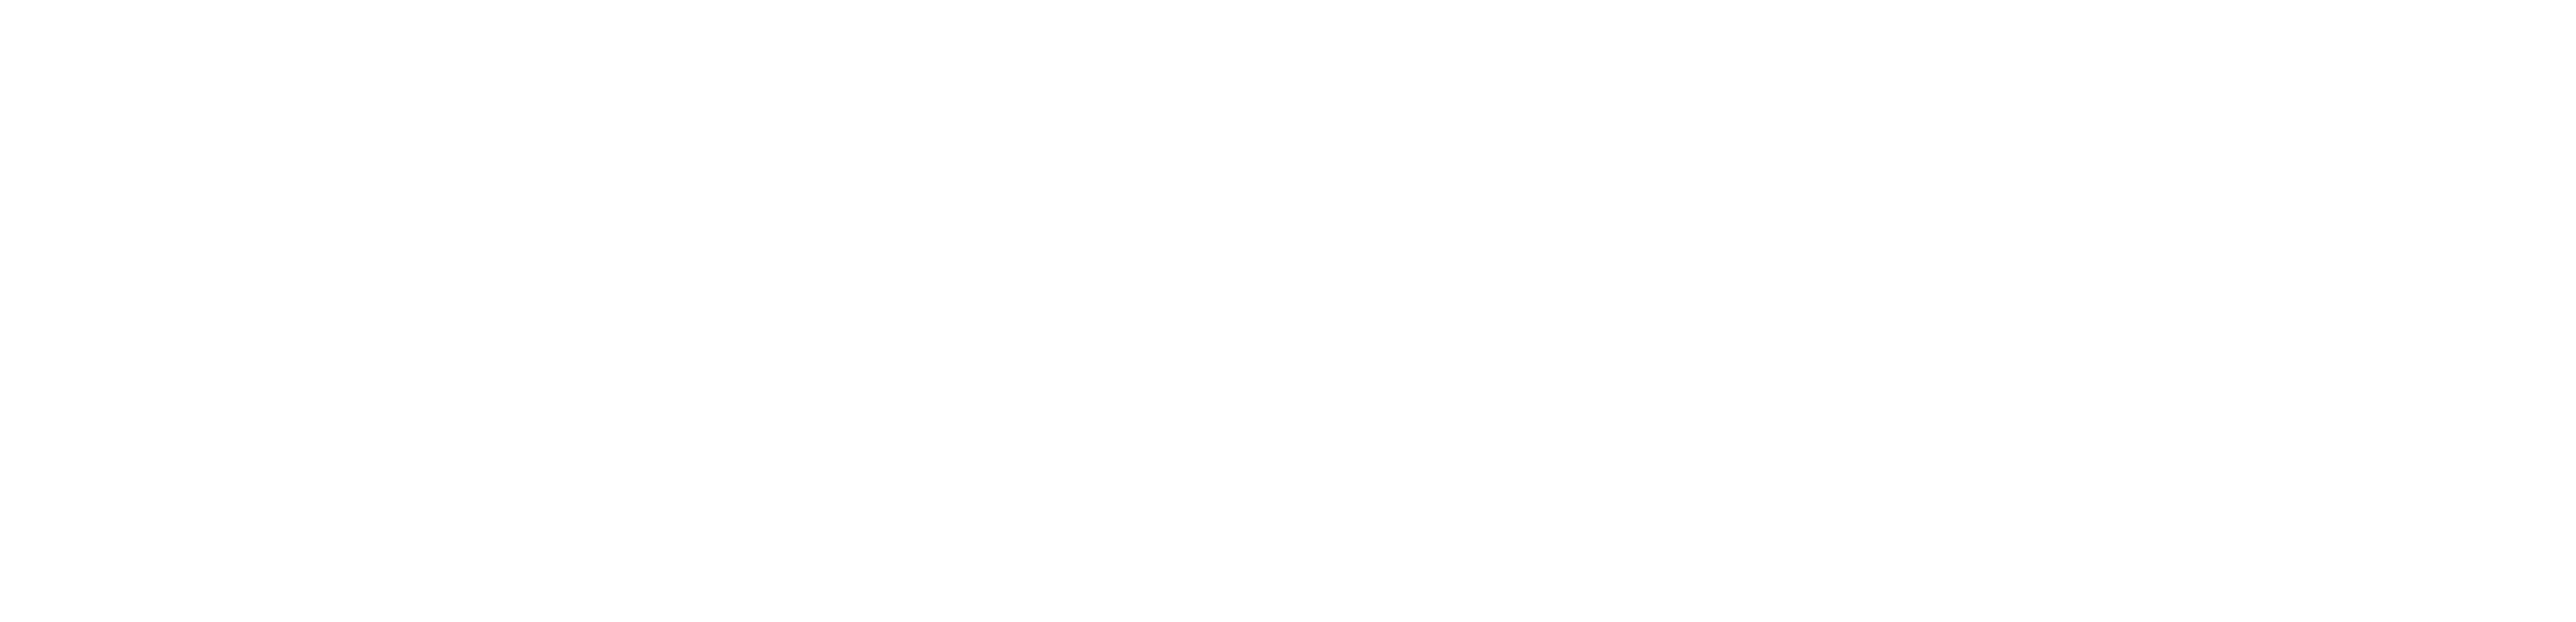 7cfff6a2137 January Furniture Show  Trade Fair   Exhibition NEC Birmingham 2020